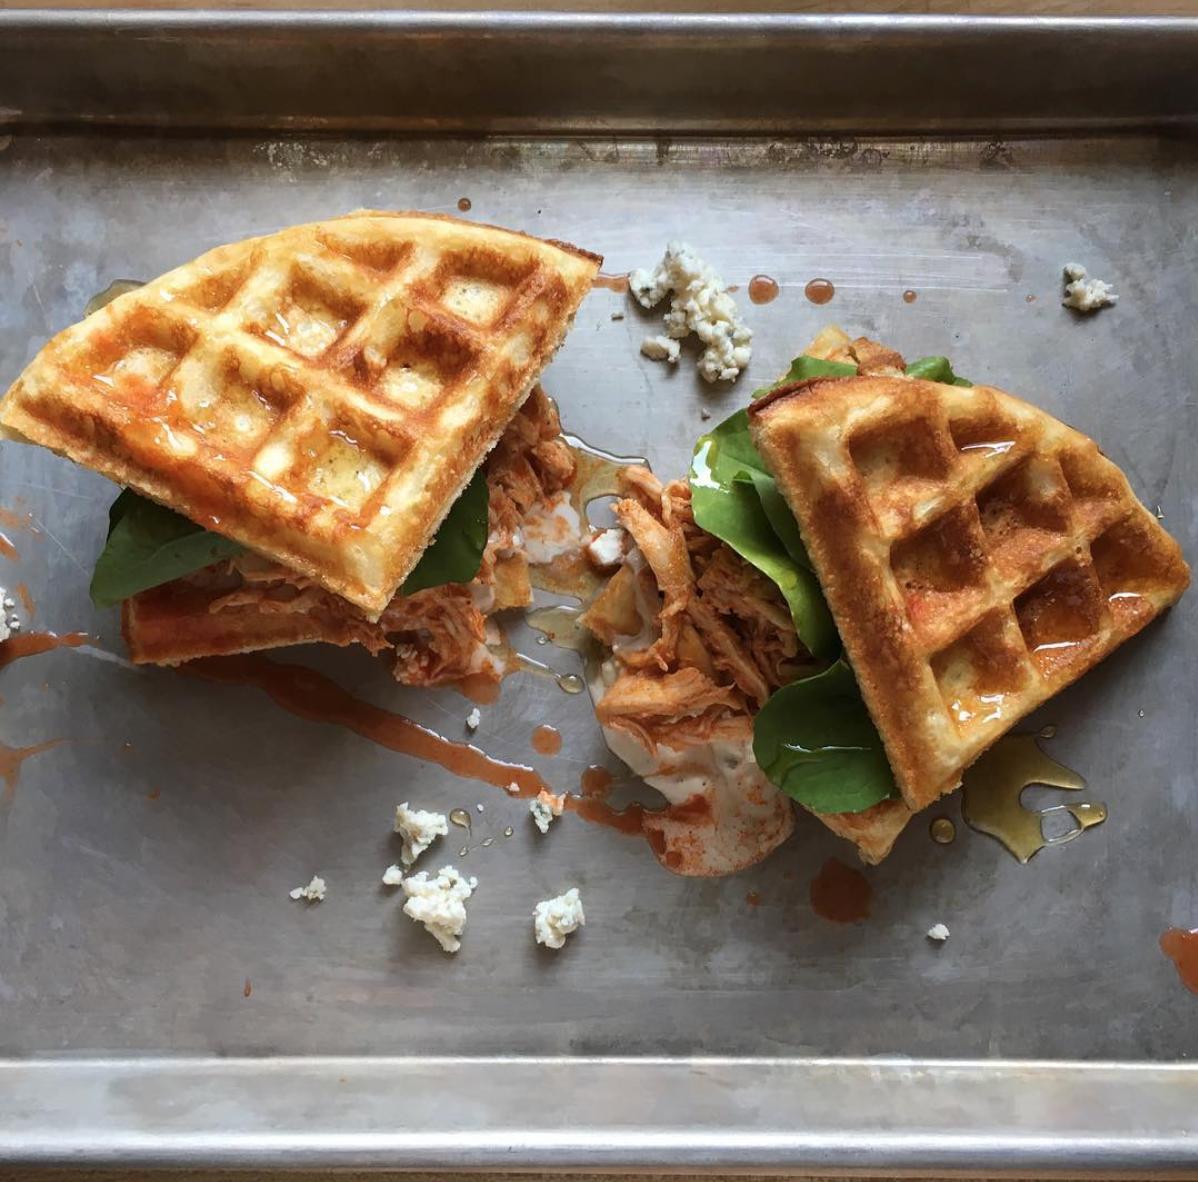 Chicken & Waffles -